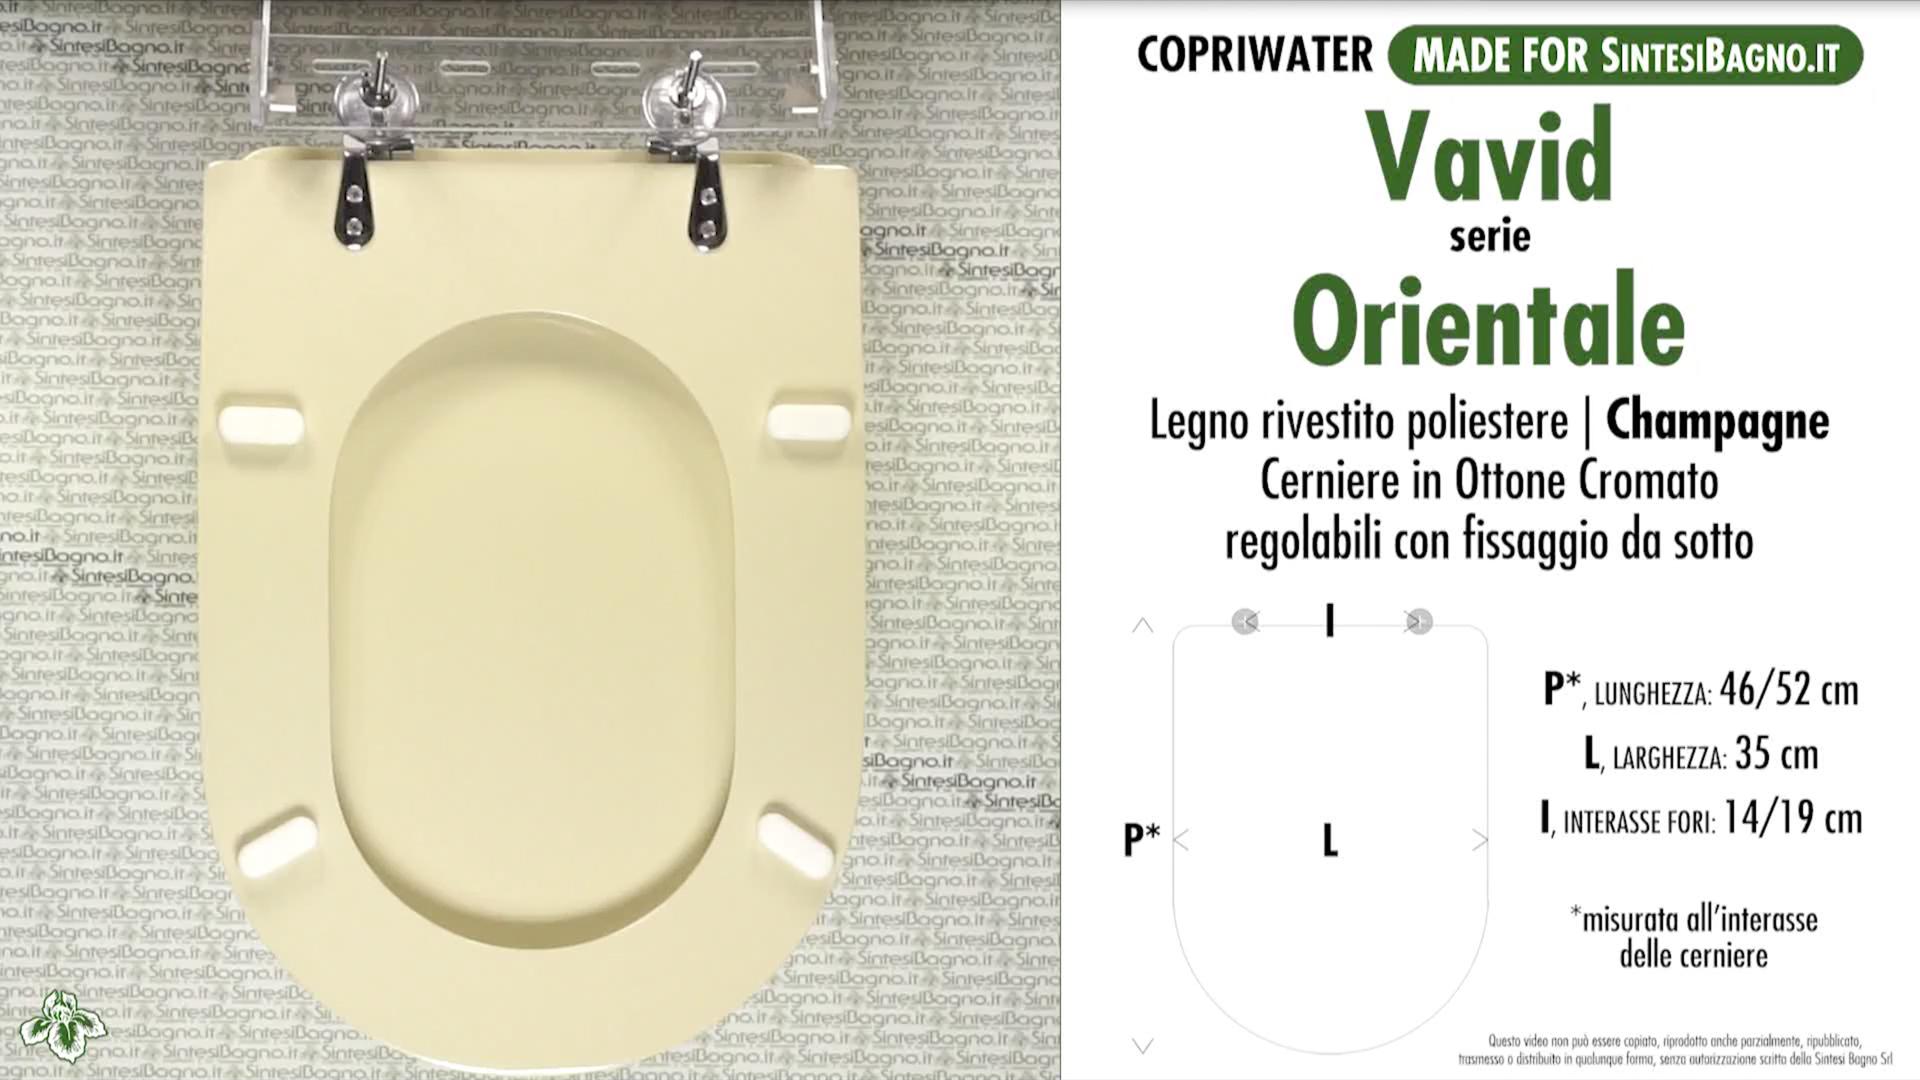 "SCHEDA TECNICA MISURE copriwater VAVID ORIENTALE"""